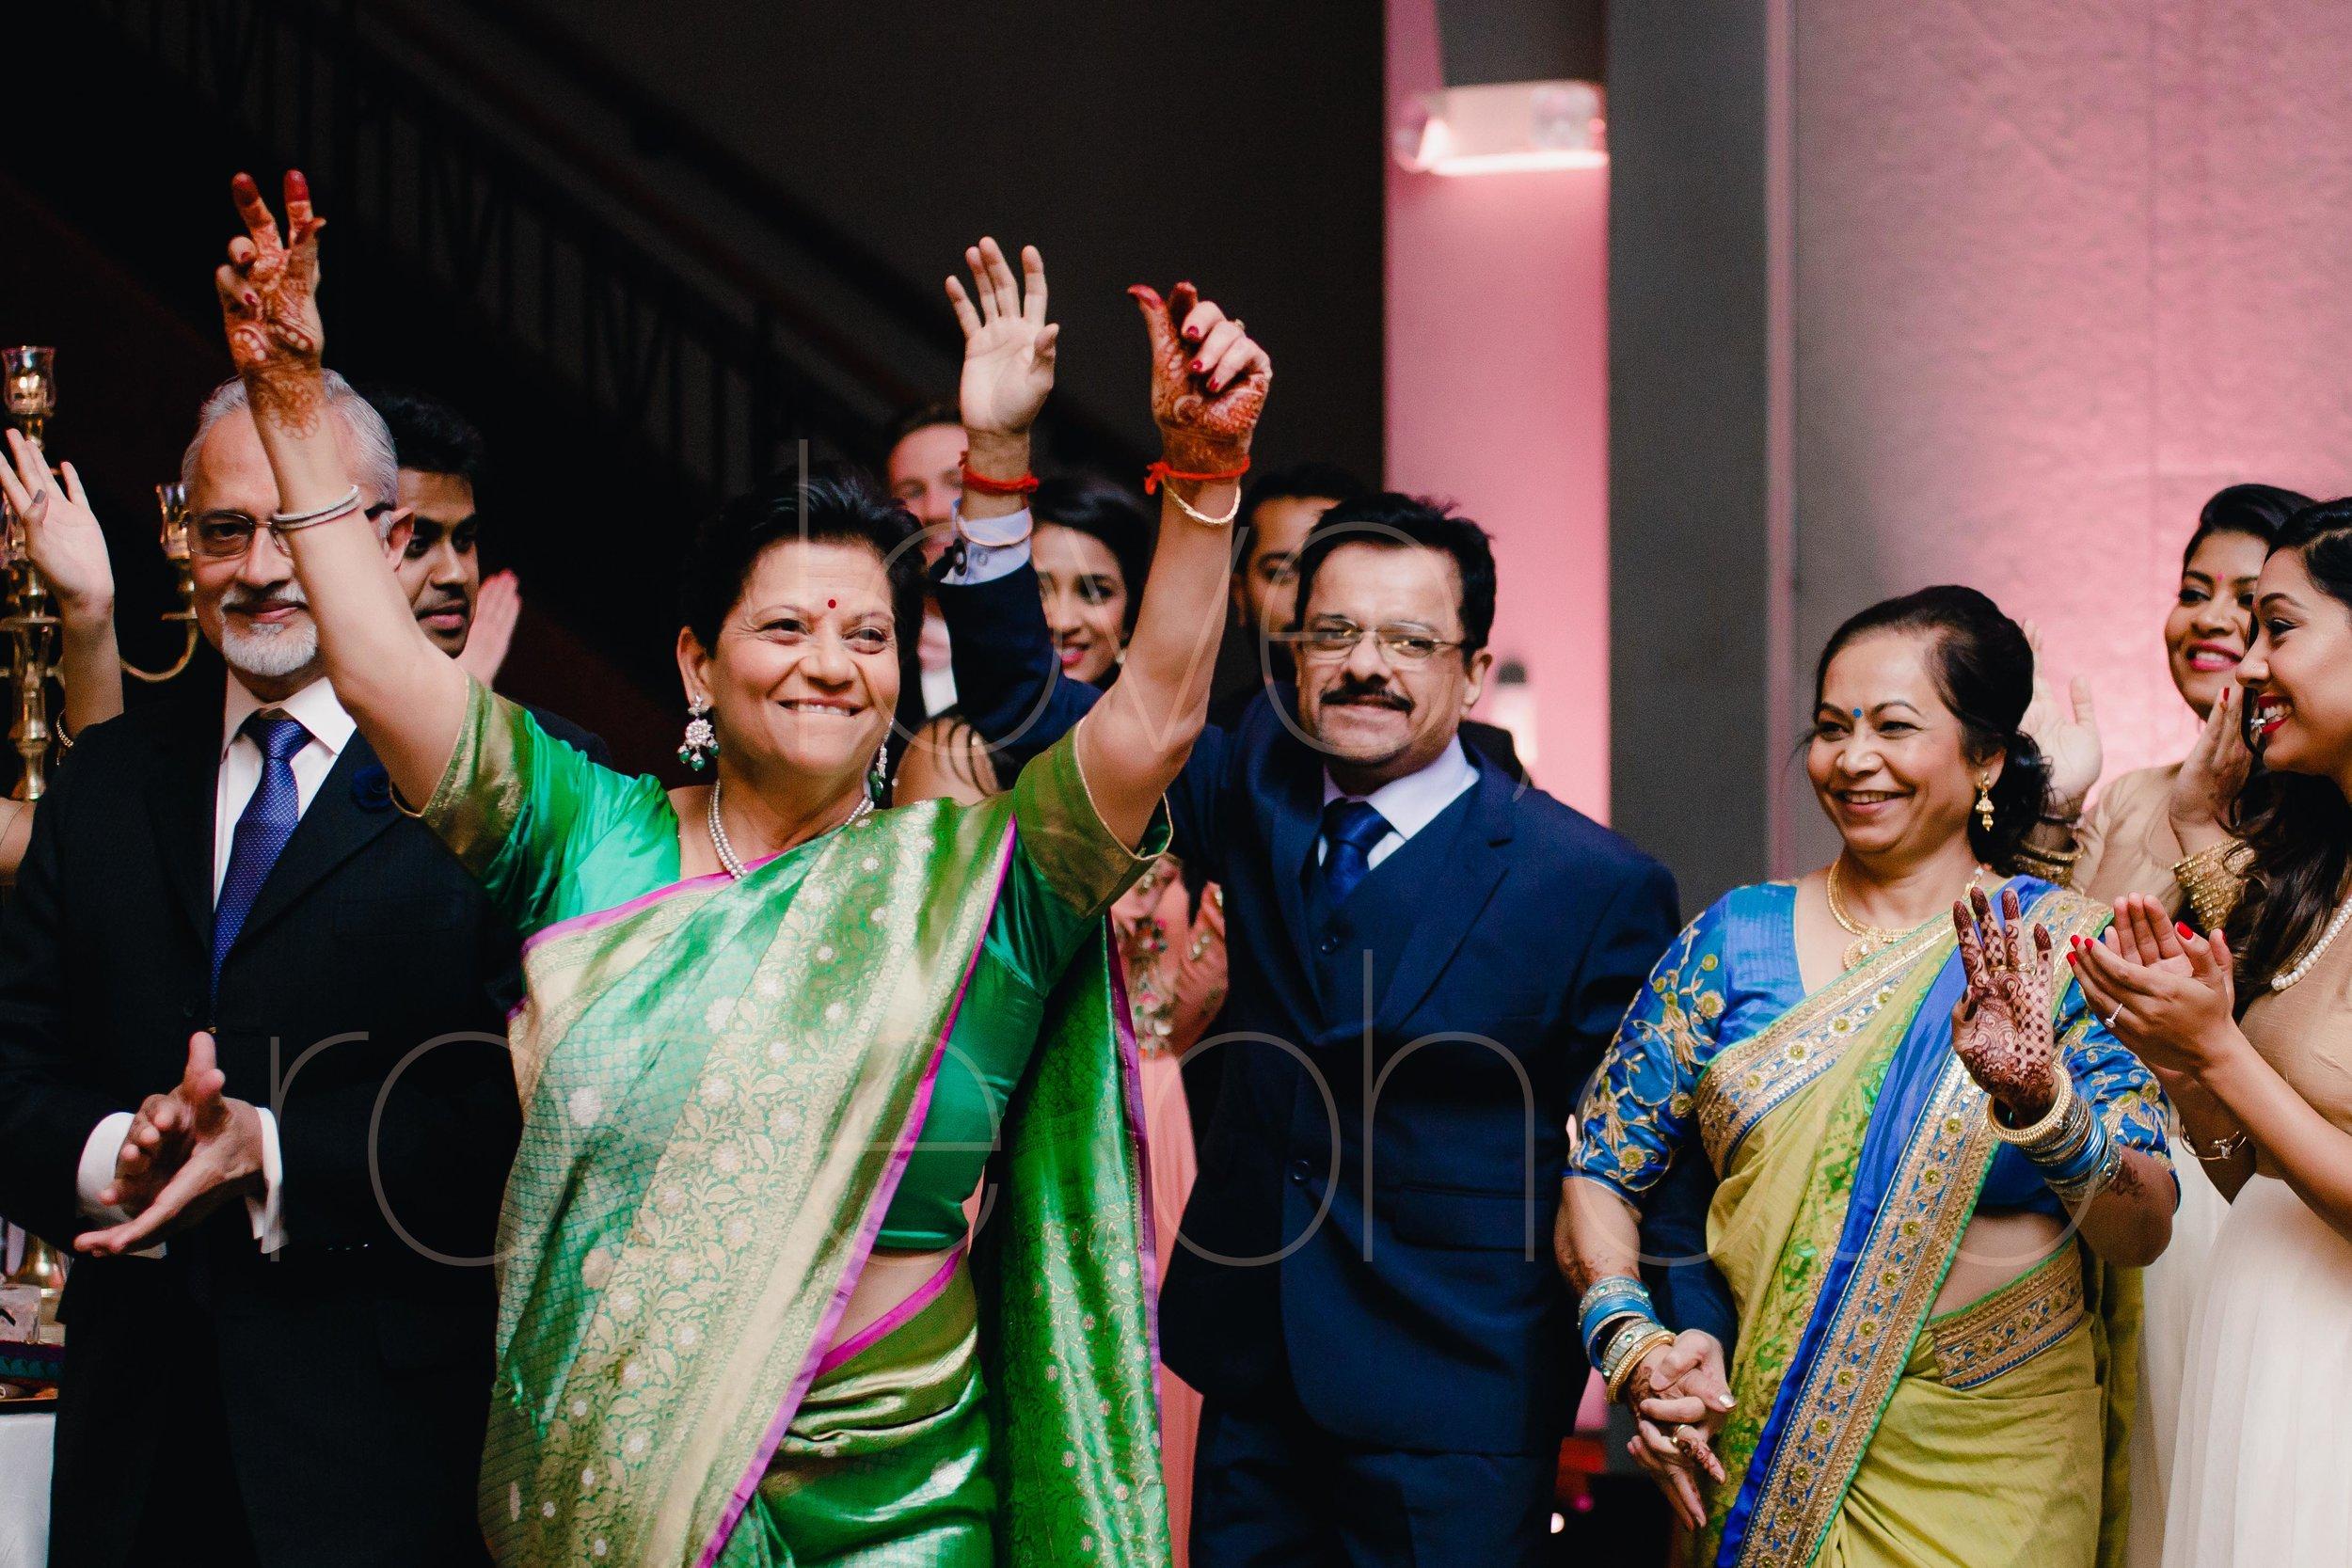 Chicago Indian Wedding best photography lifestyle wedding portrait luxury wedding-51.jpg